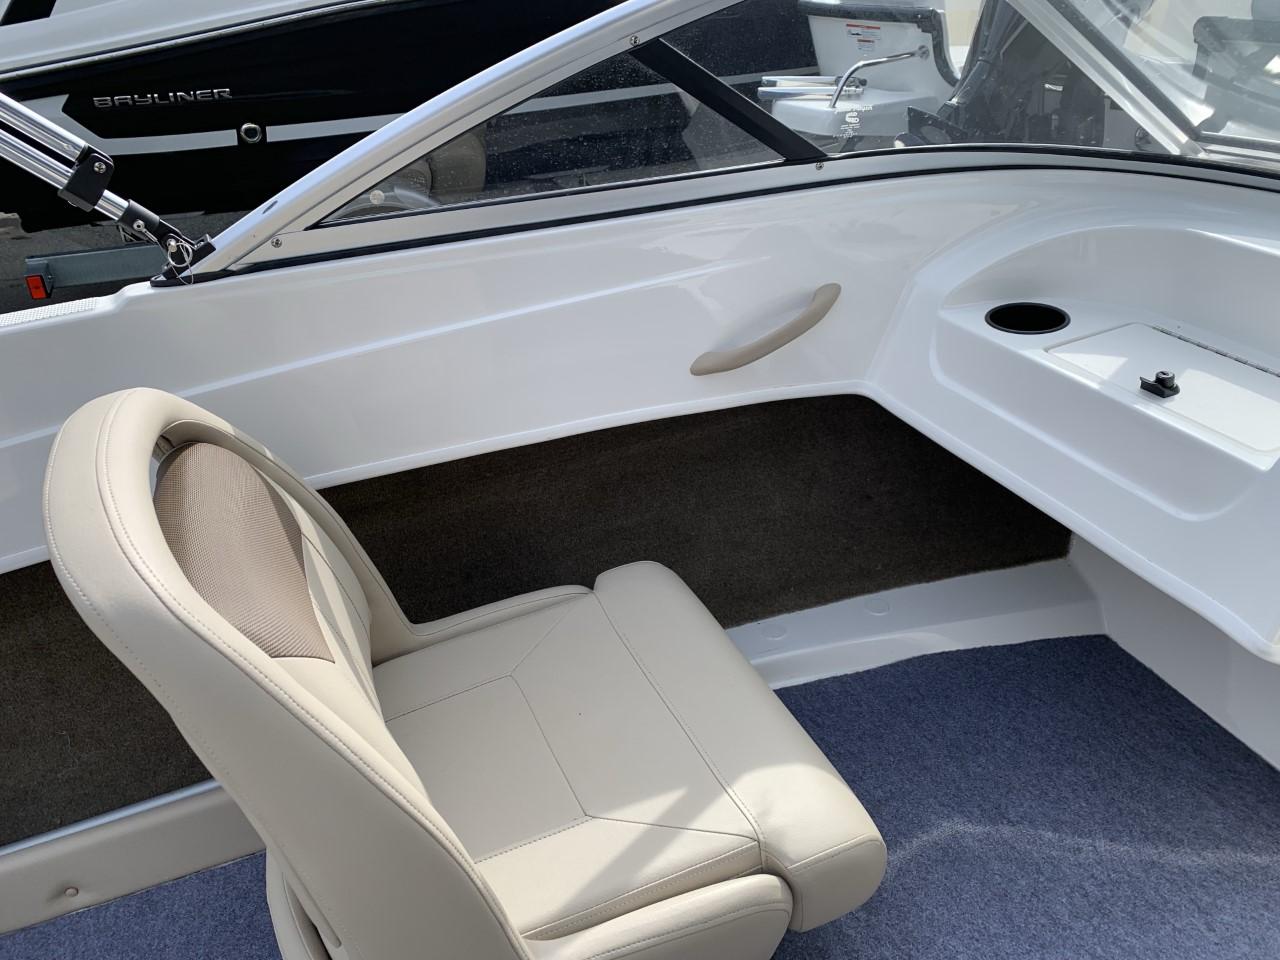 2016 Bayliner boat for sale, model of the boat is 170 Bowrider & Image # 3 of 3